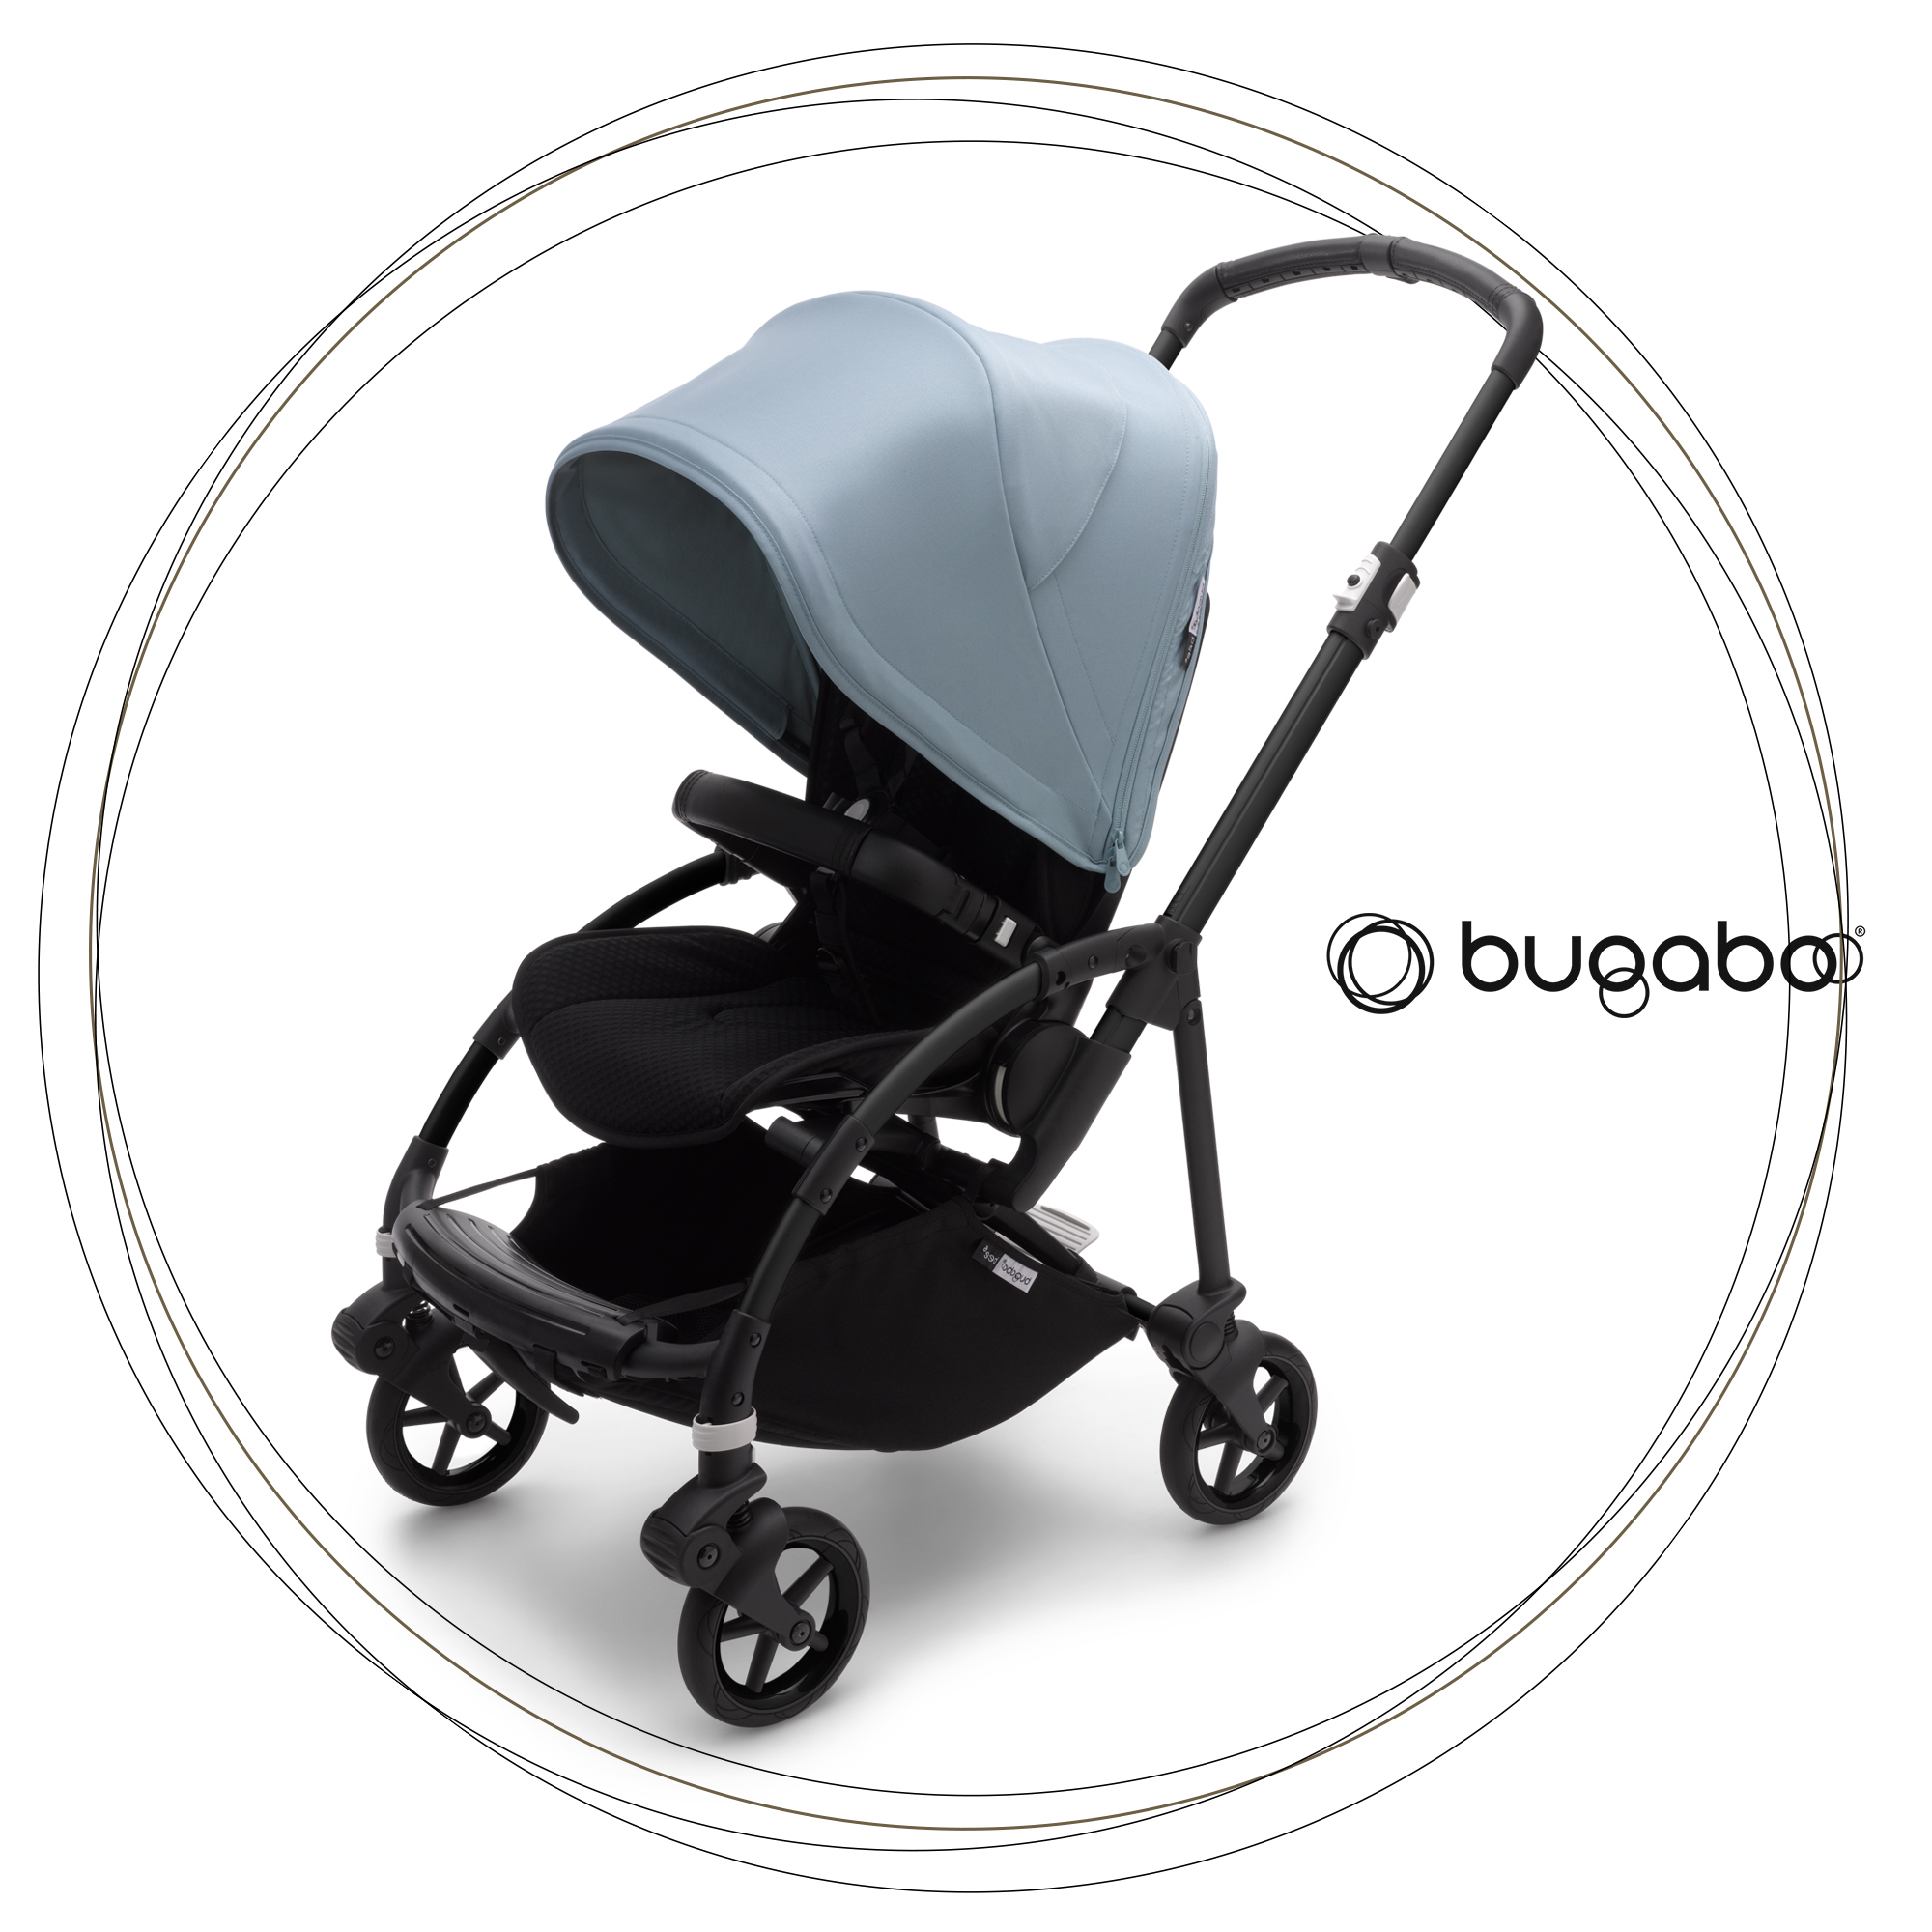 BUGABOO Bee 6 Podvozok BLACK poťah športového sedadla BLACK strieška VAPOR BLUE